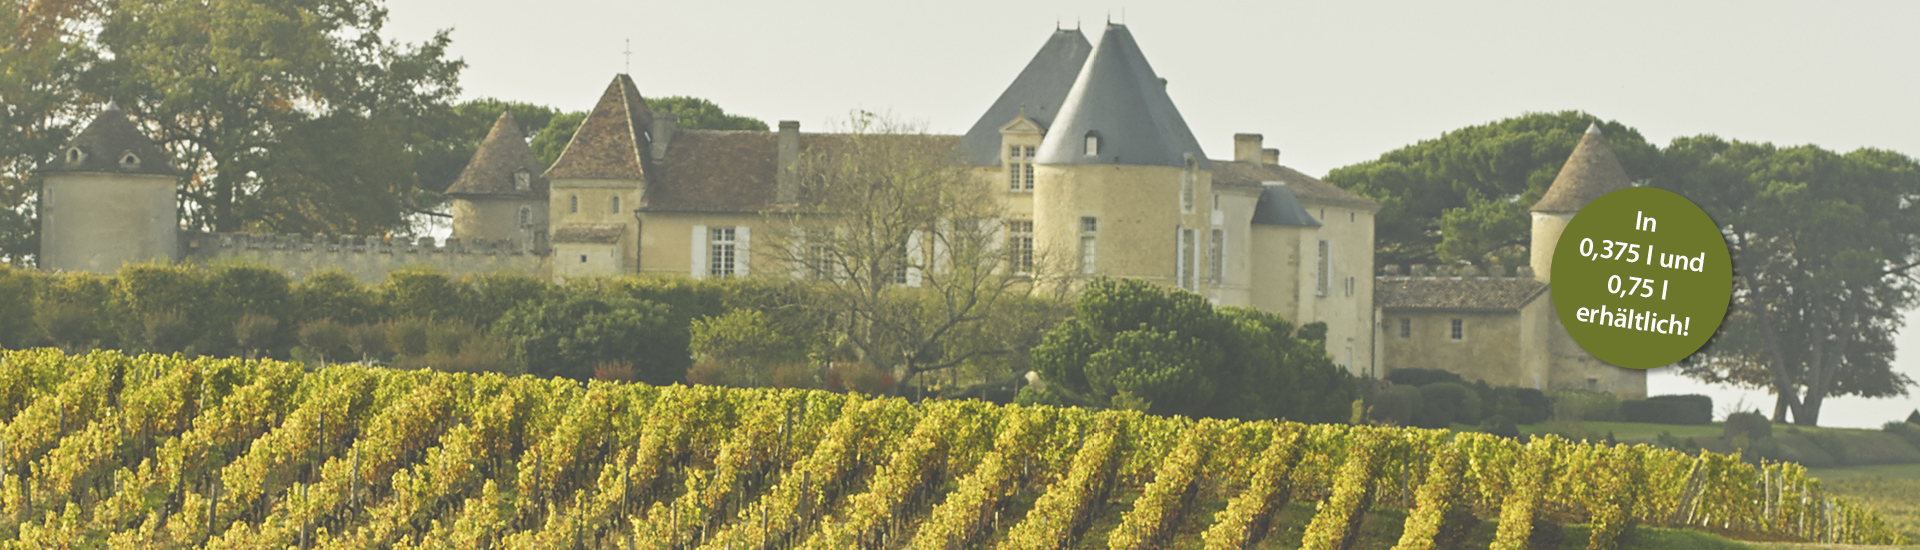 Weine - Rarität des Monats: Château d'Yquem 2013 02/2018 - Slider